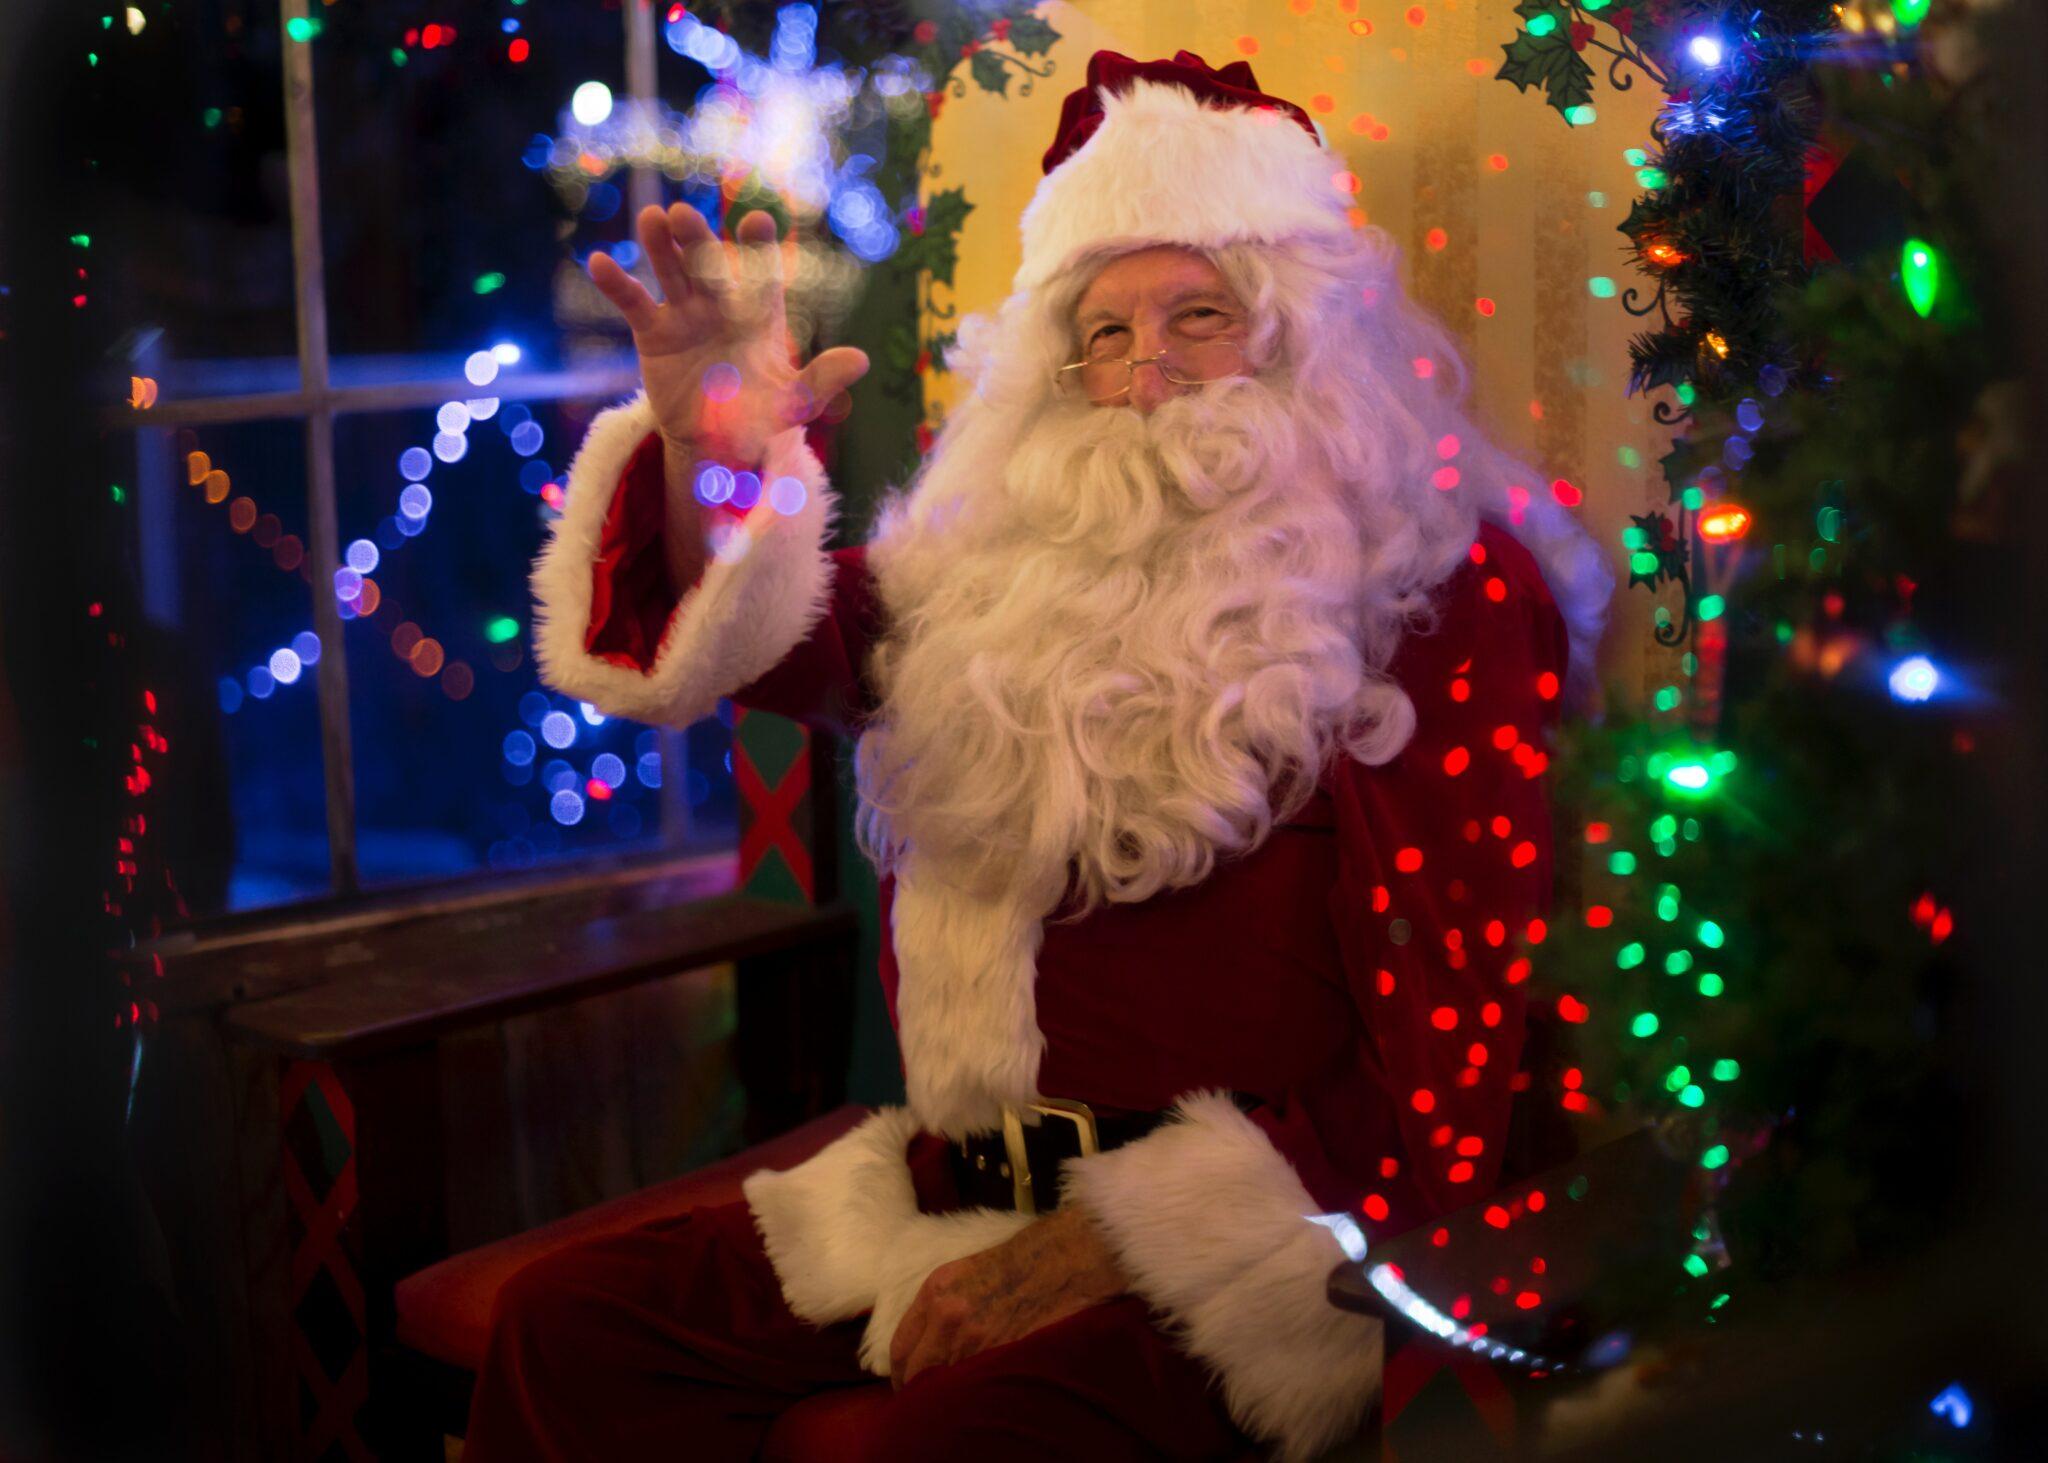 Kerstmis kerstman kerst kerstmarkt